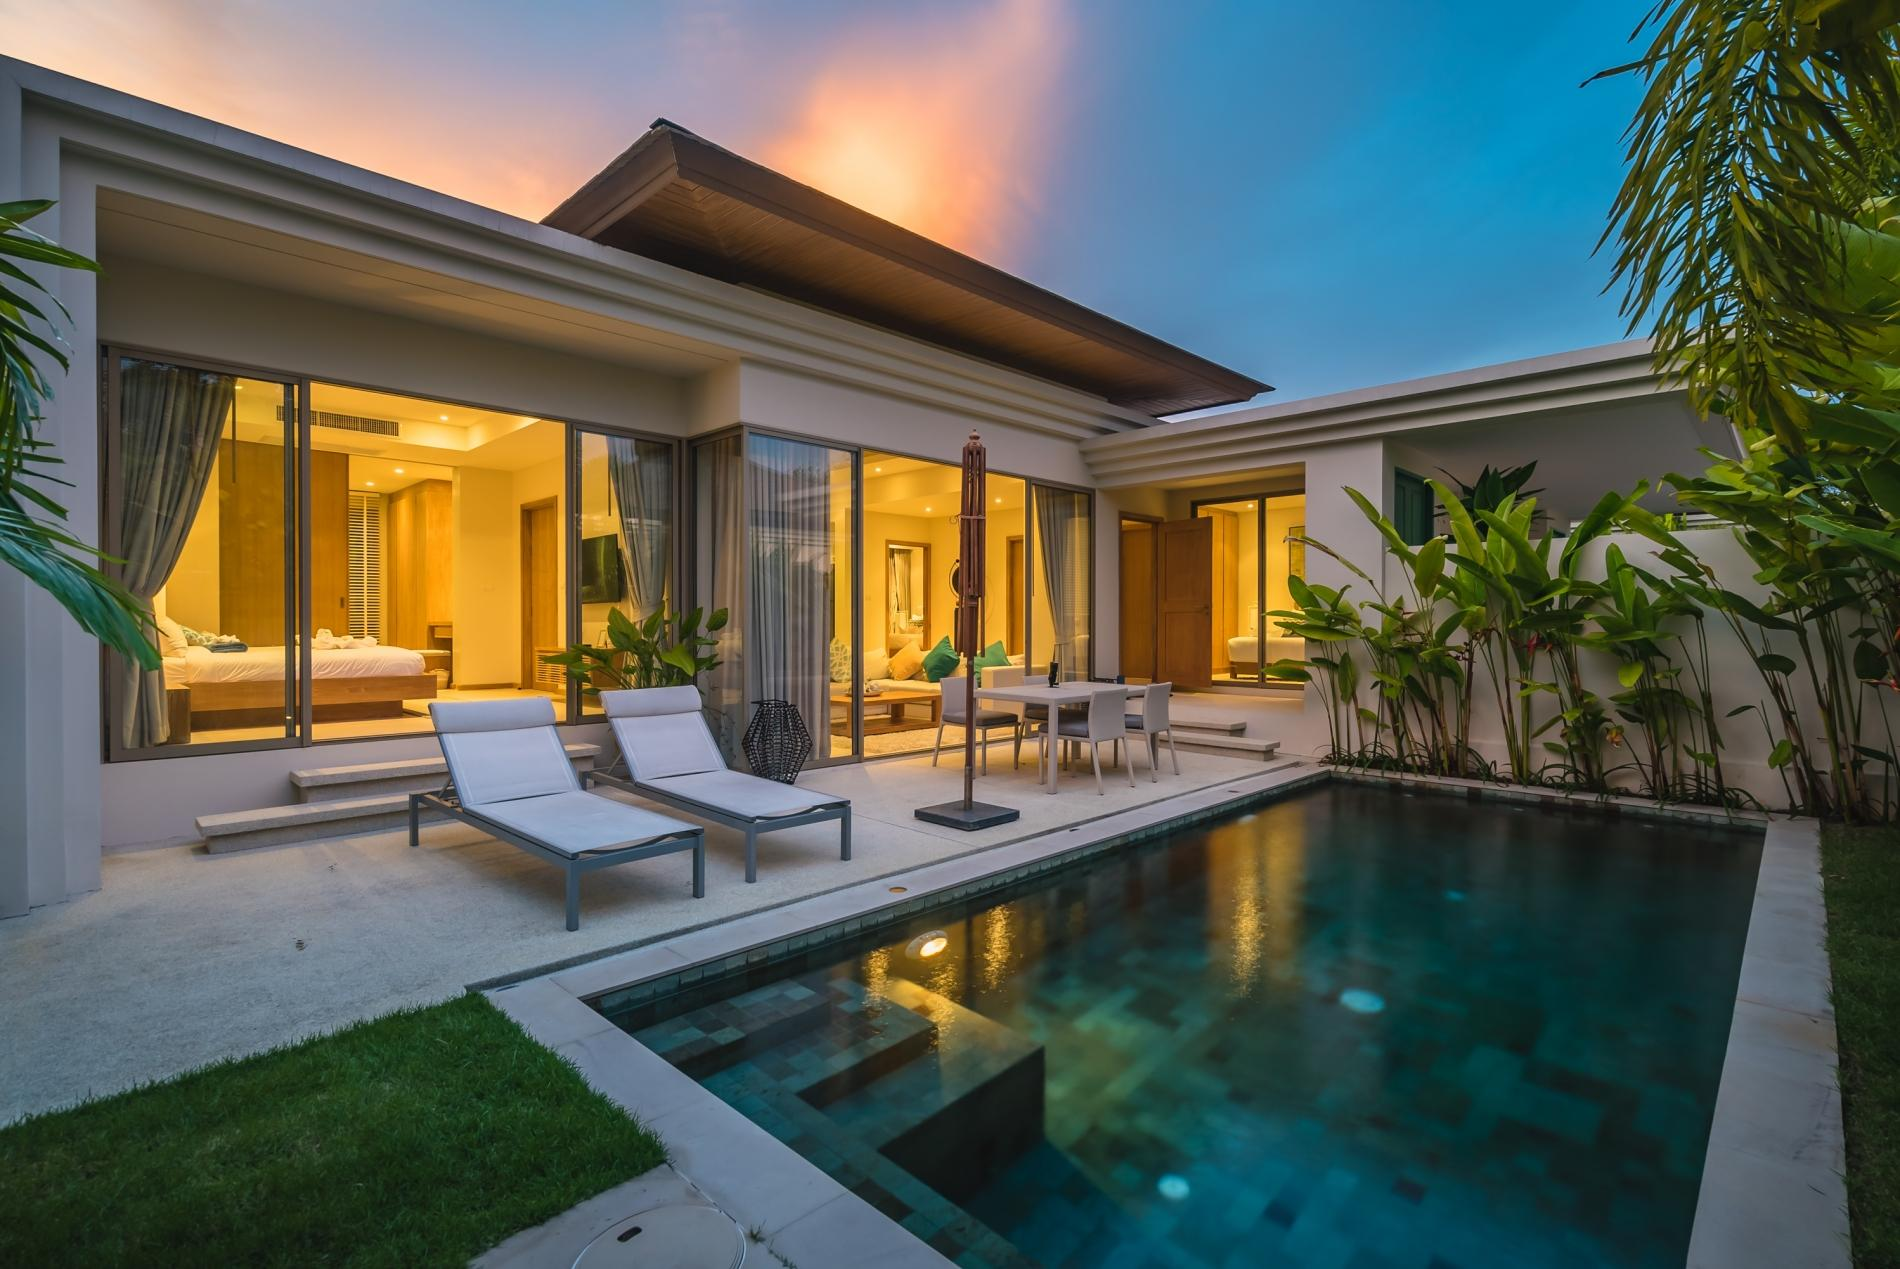 Apartment Trichada 18 - Private pool modern 3 bedroom villa photo 18771831